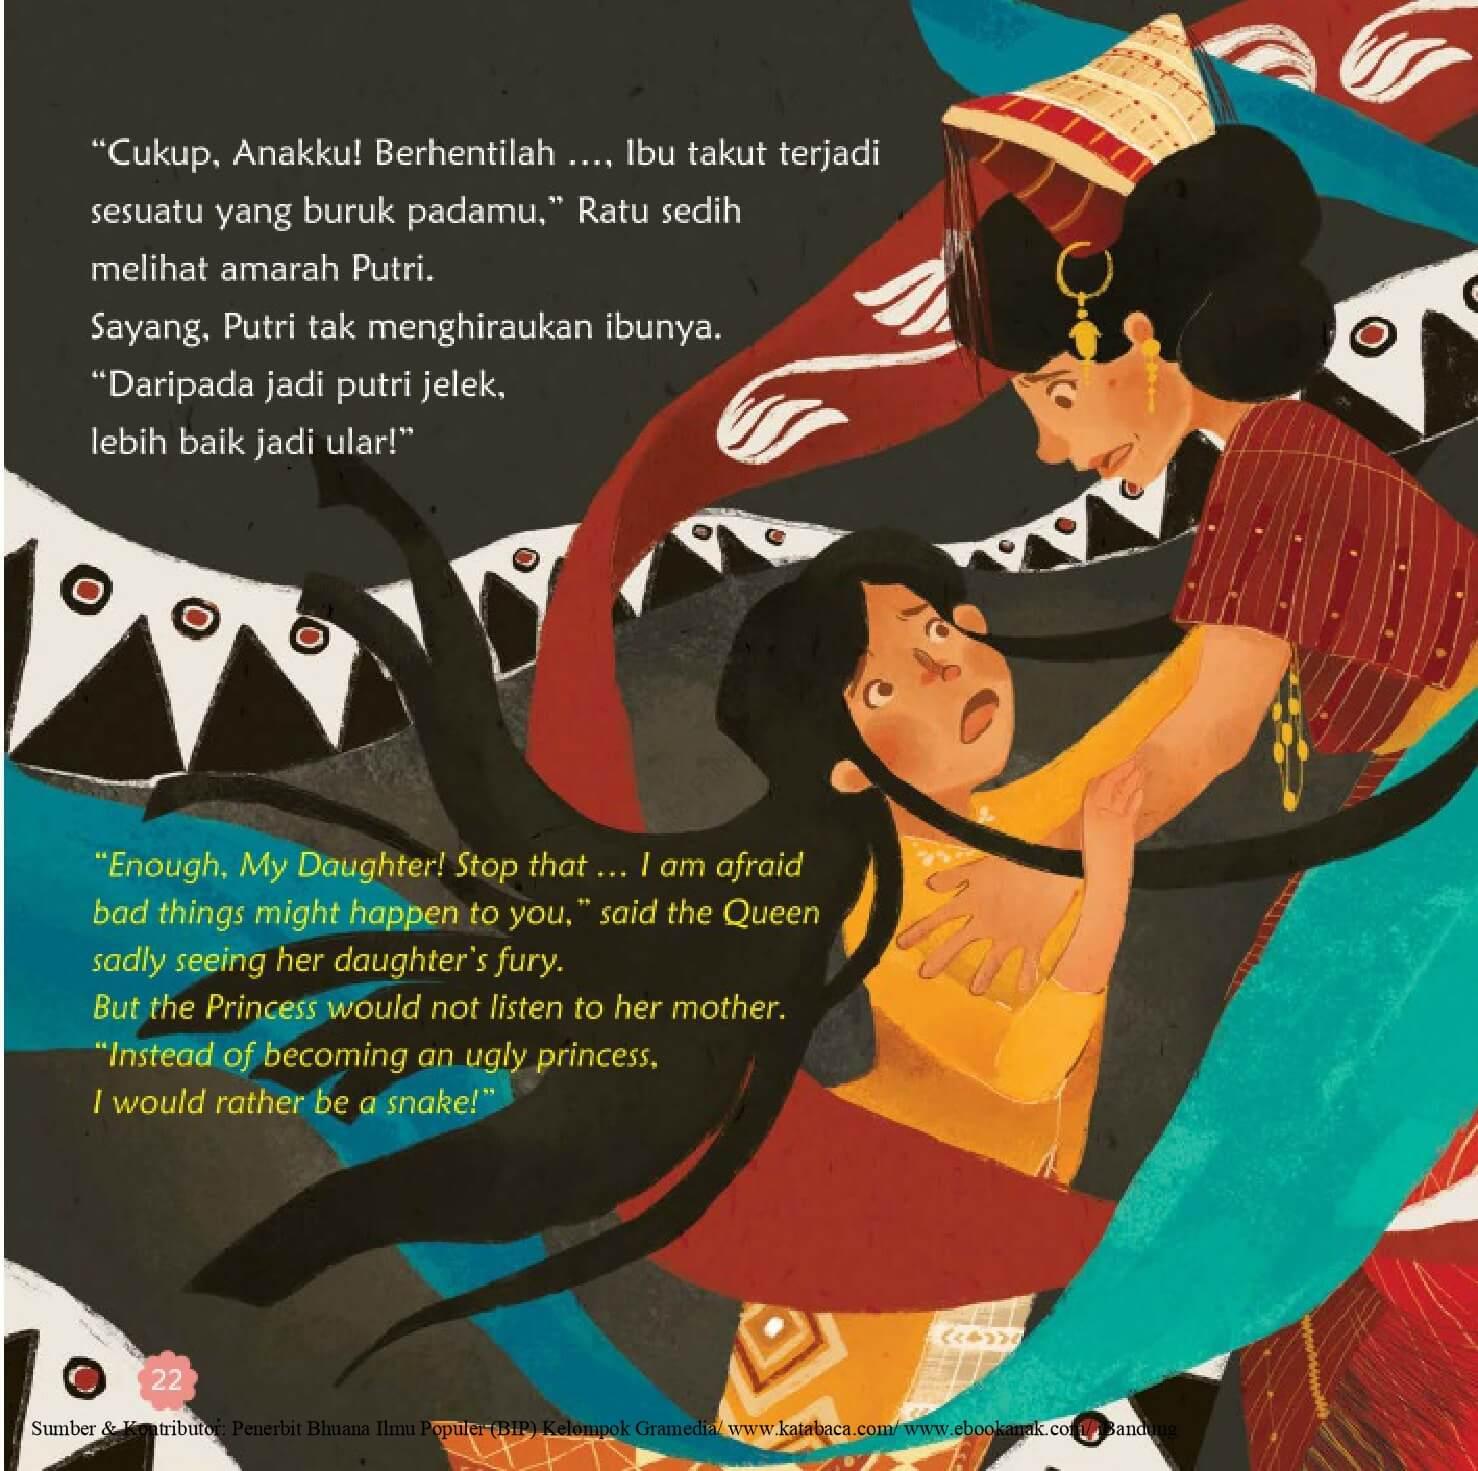 Ebook Seri Cerita Rakyat 34 Provinsi, Putri Ular (Sumatra Utara) (23)